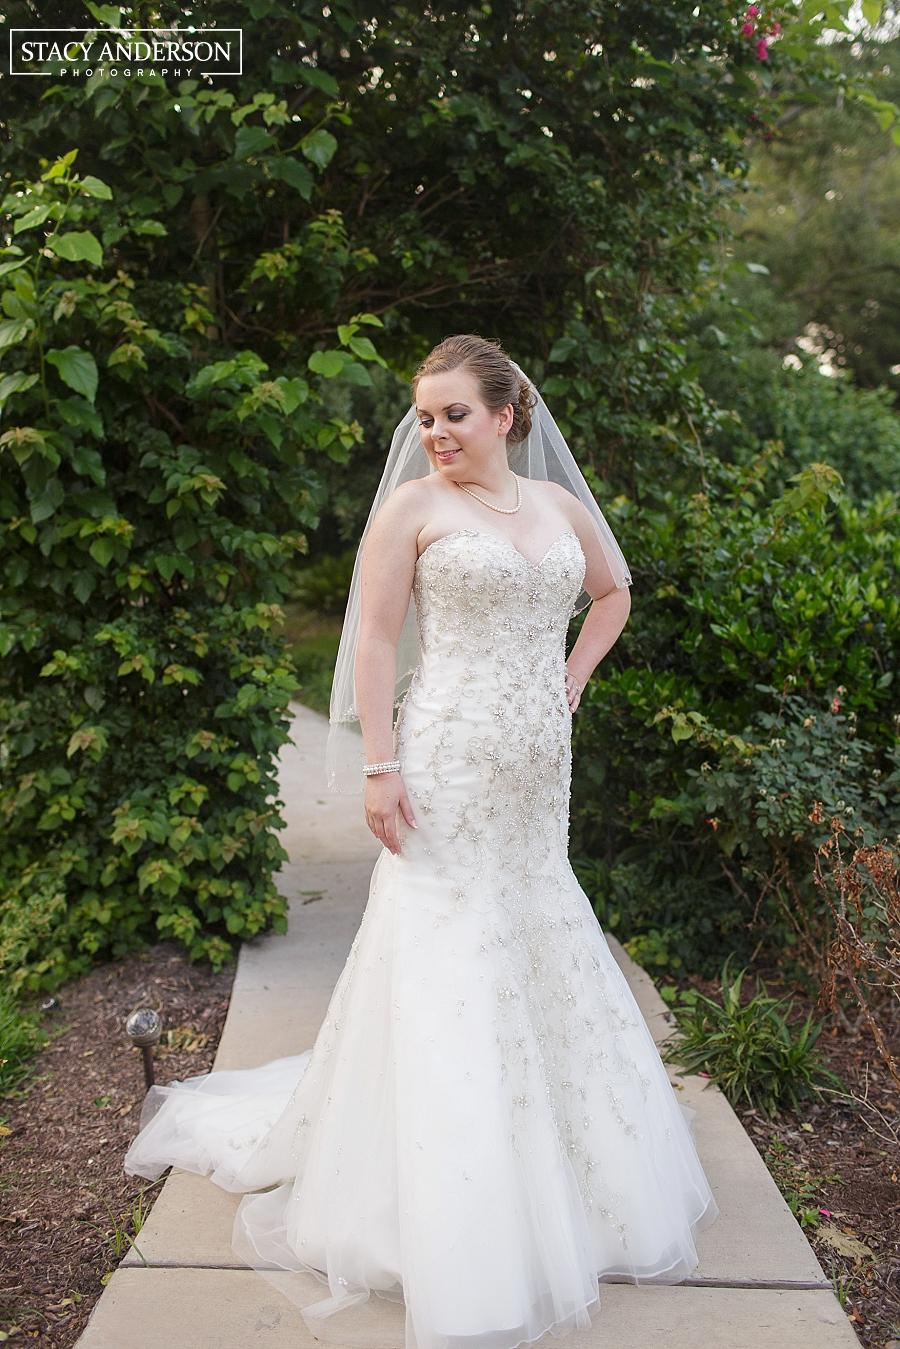 Stacy Anderson Photography Heaven on Earth Wedding Photographer_1706